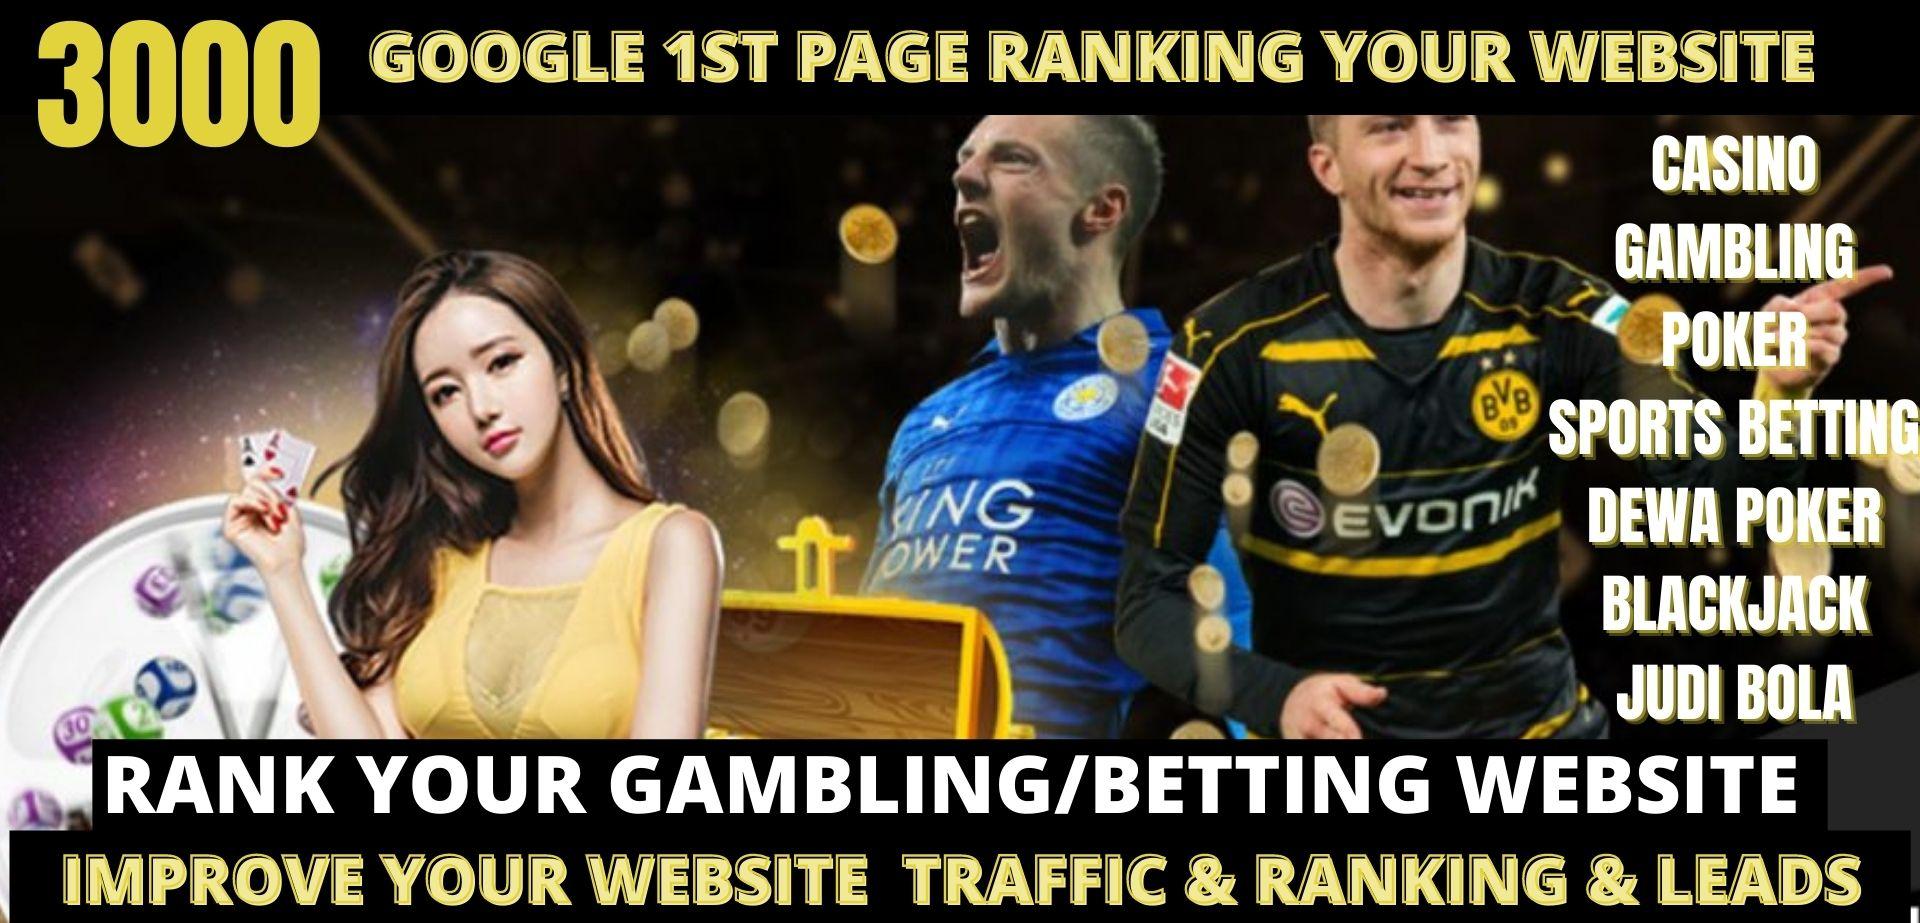 Permanent 3000+ pbn powerful Casino,  Gambling,  Poker,  Sports High Quality Web2.0 Backlinks